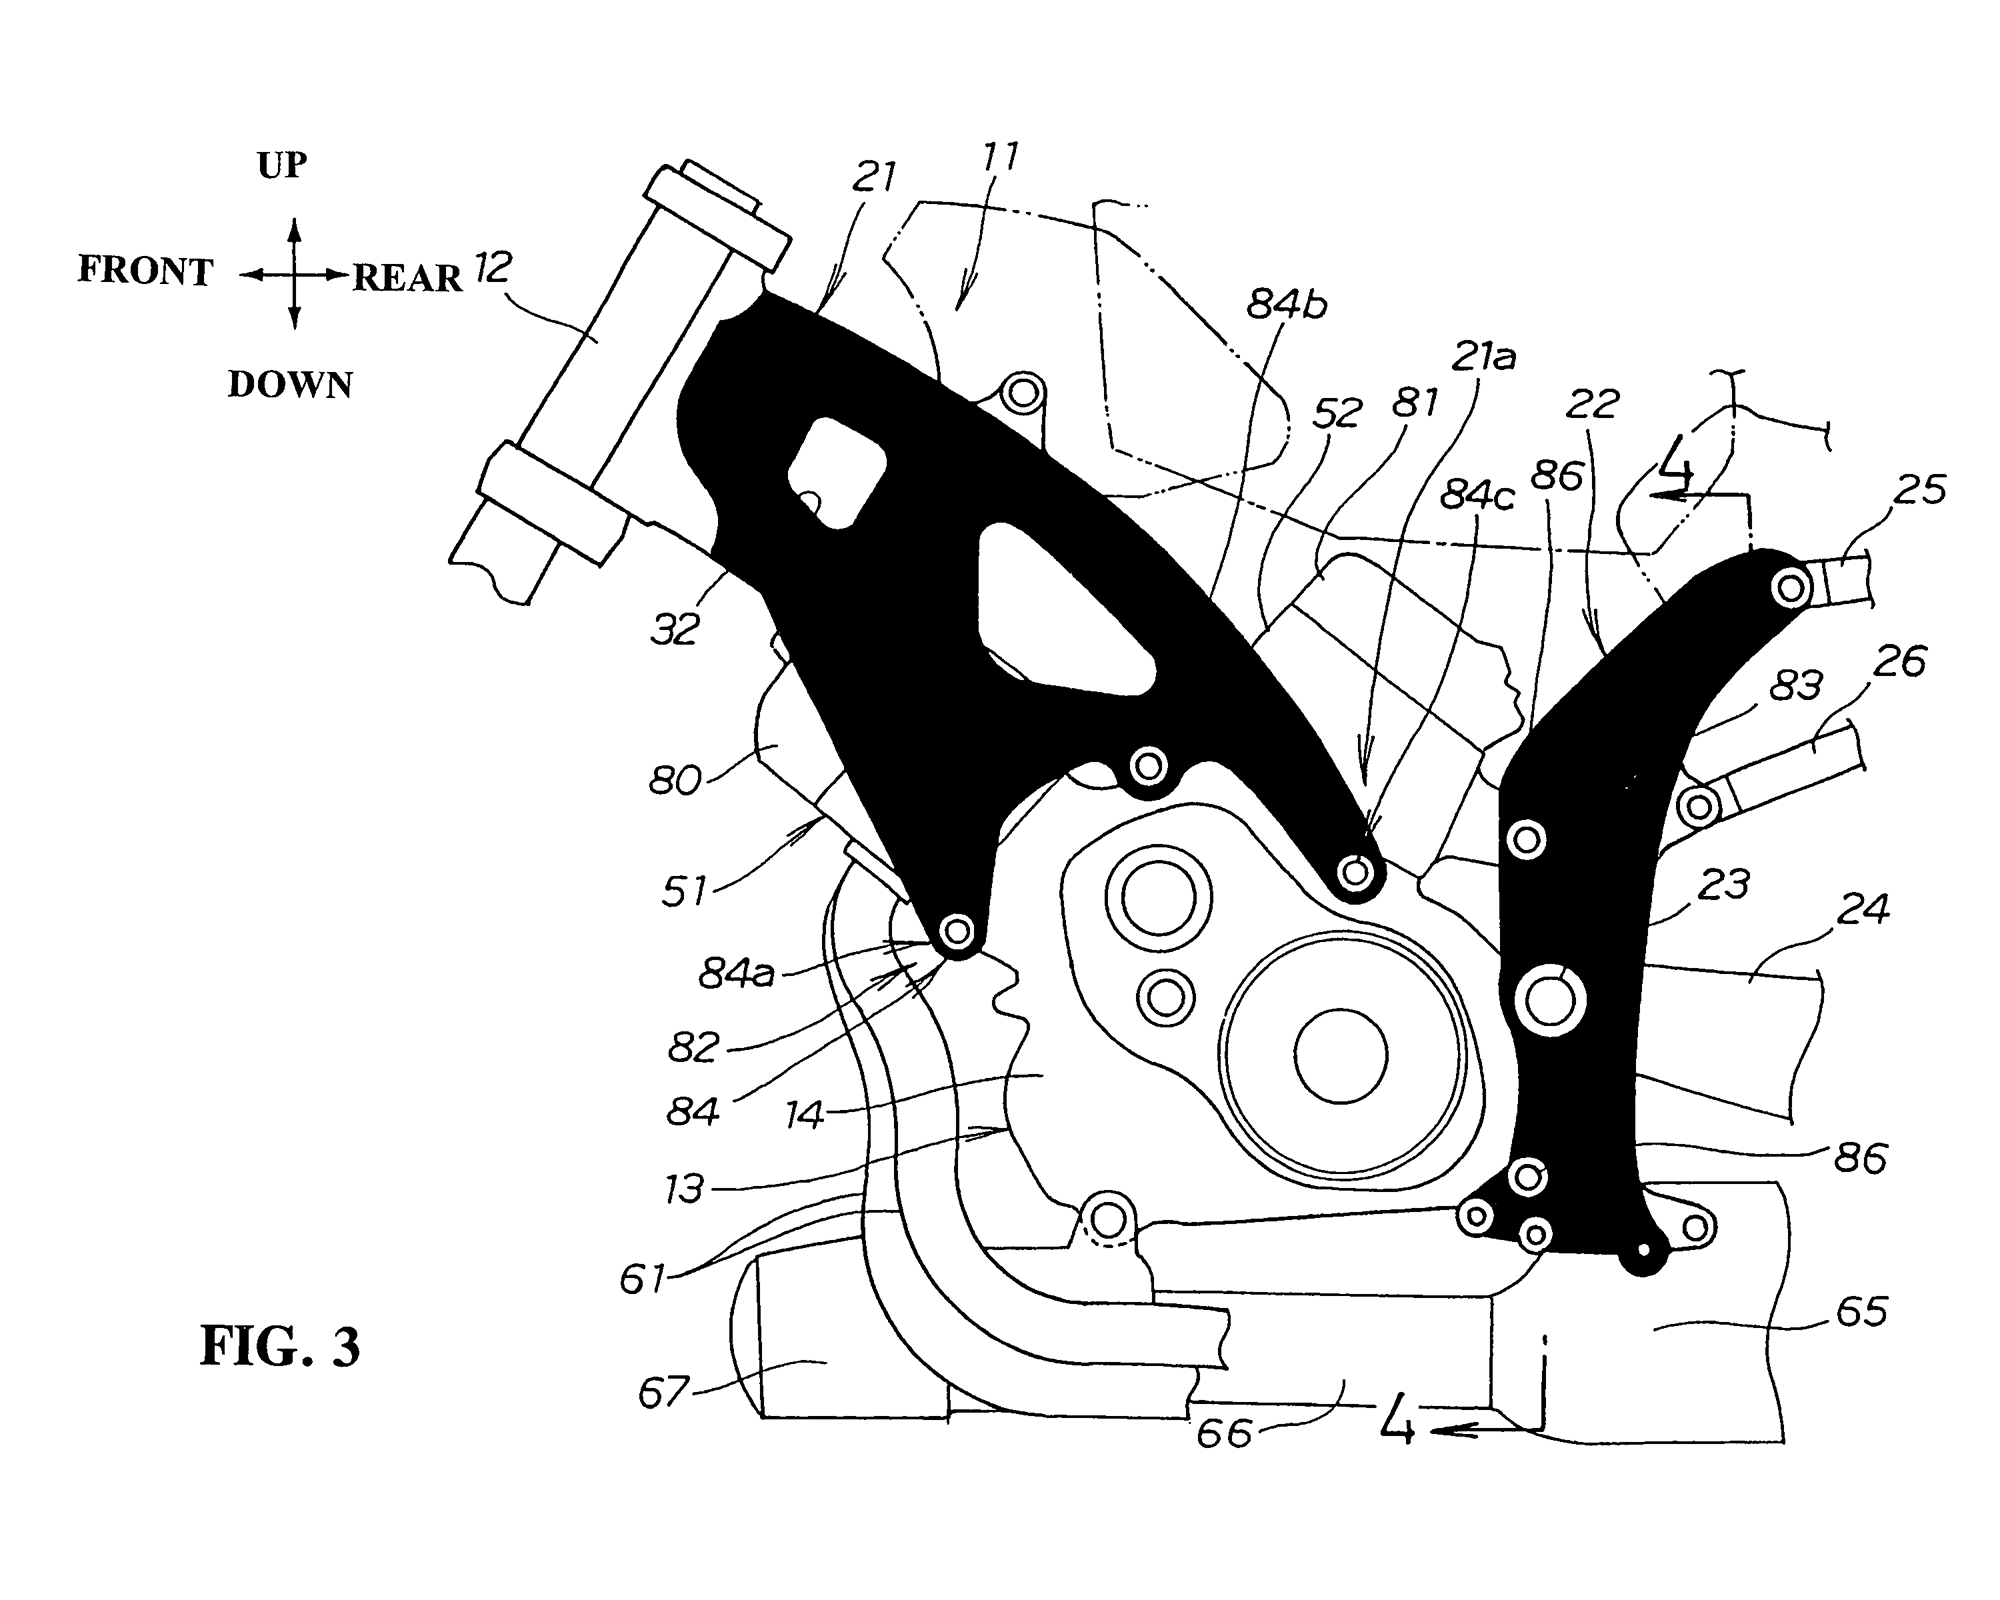 honda u0026 39 s forgotten  u0026quot frameless u0026quot  chassis design patent